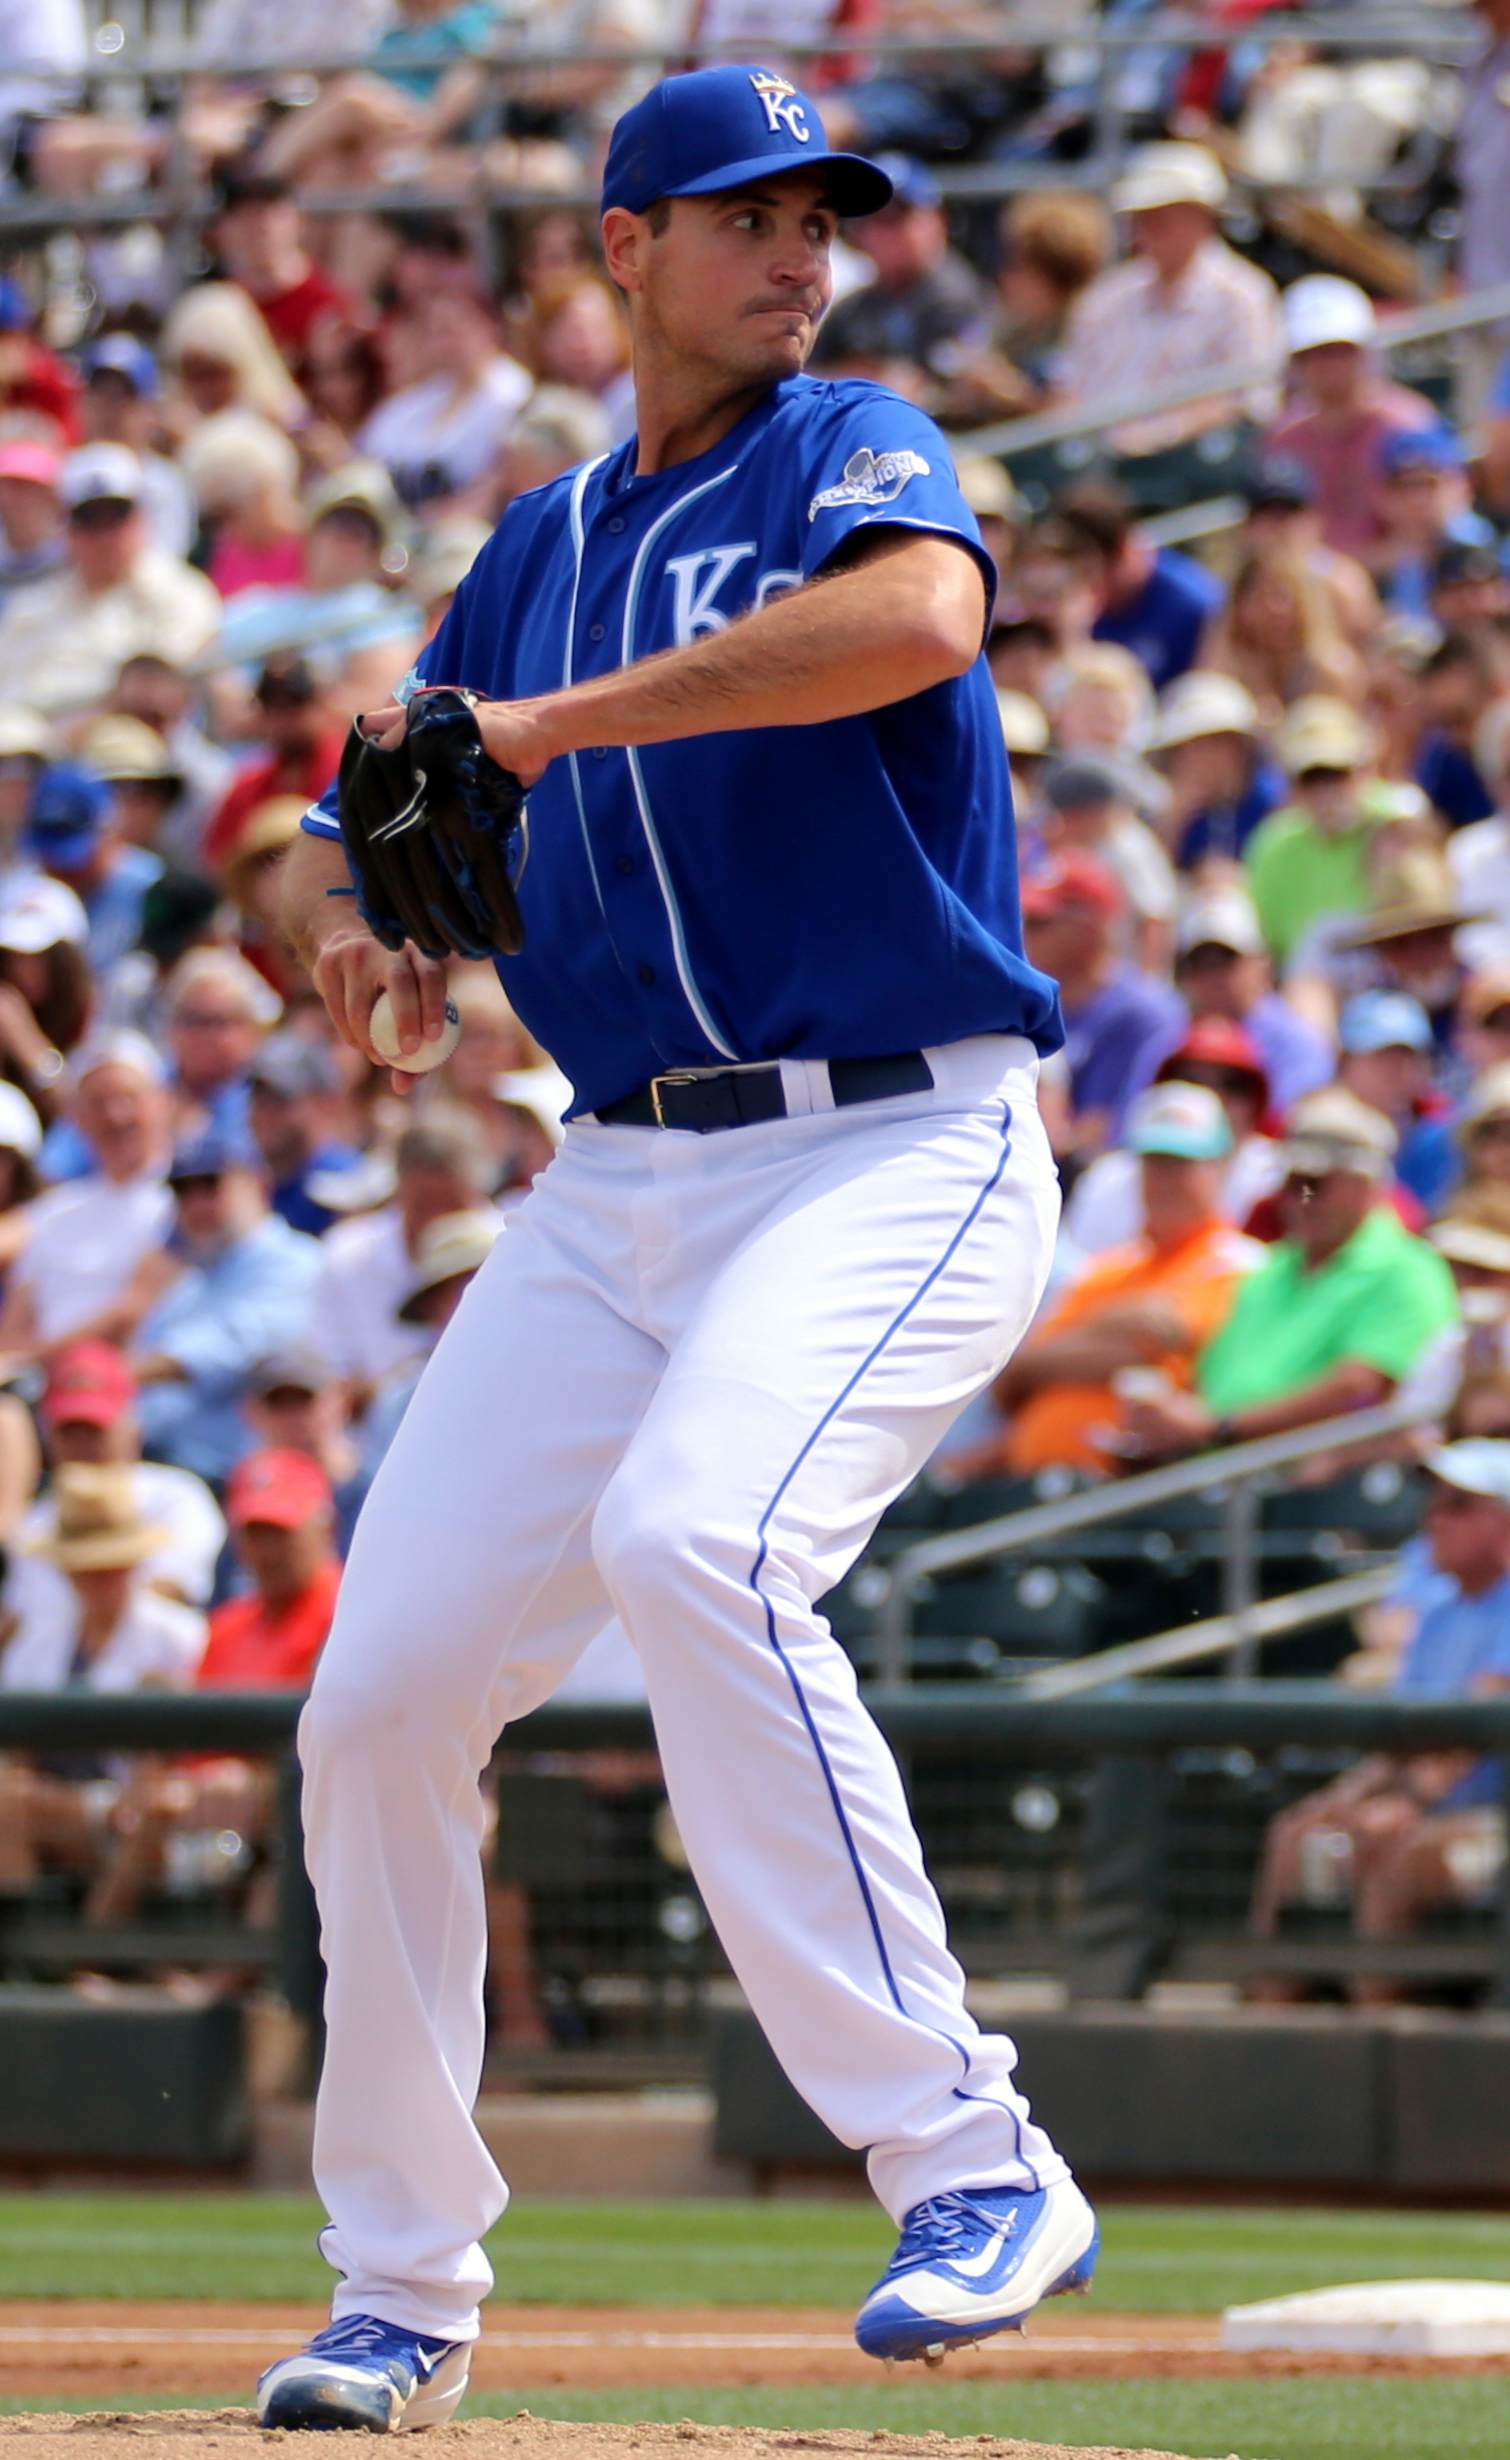 bf5efb39da0 Chris Young (pitcher) - Wikipedia